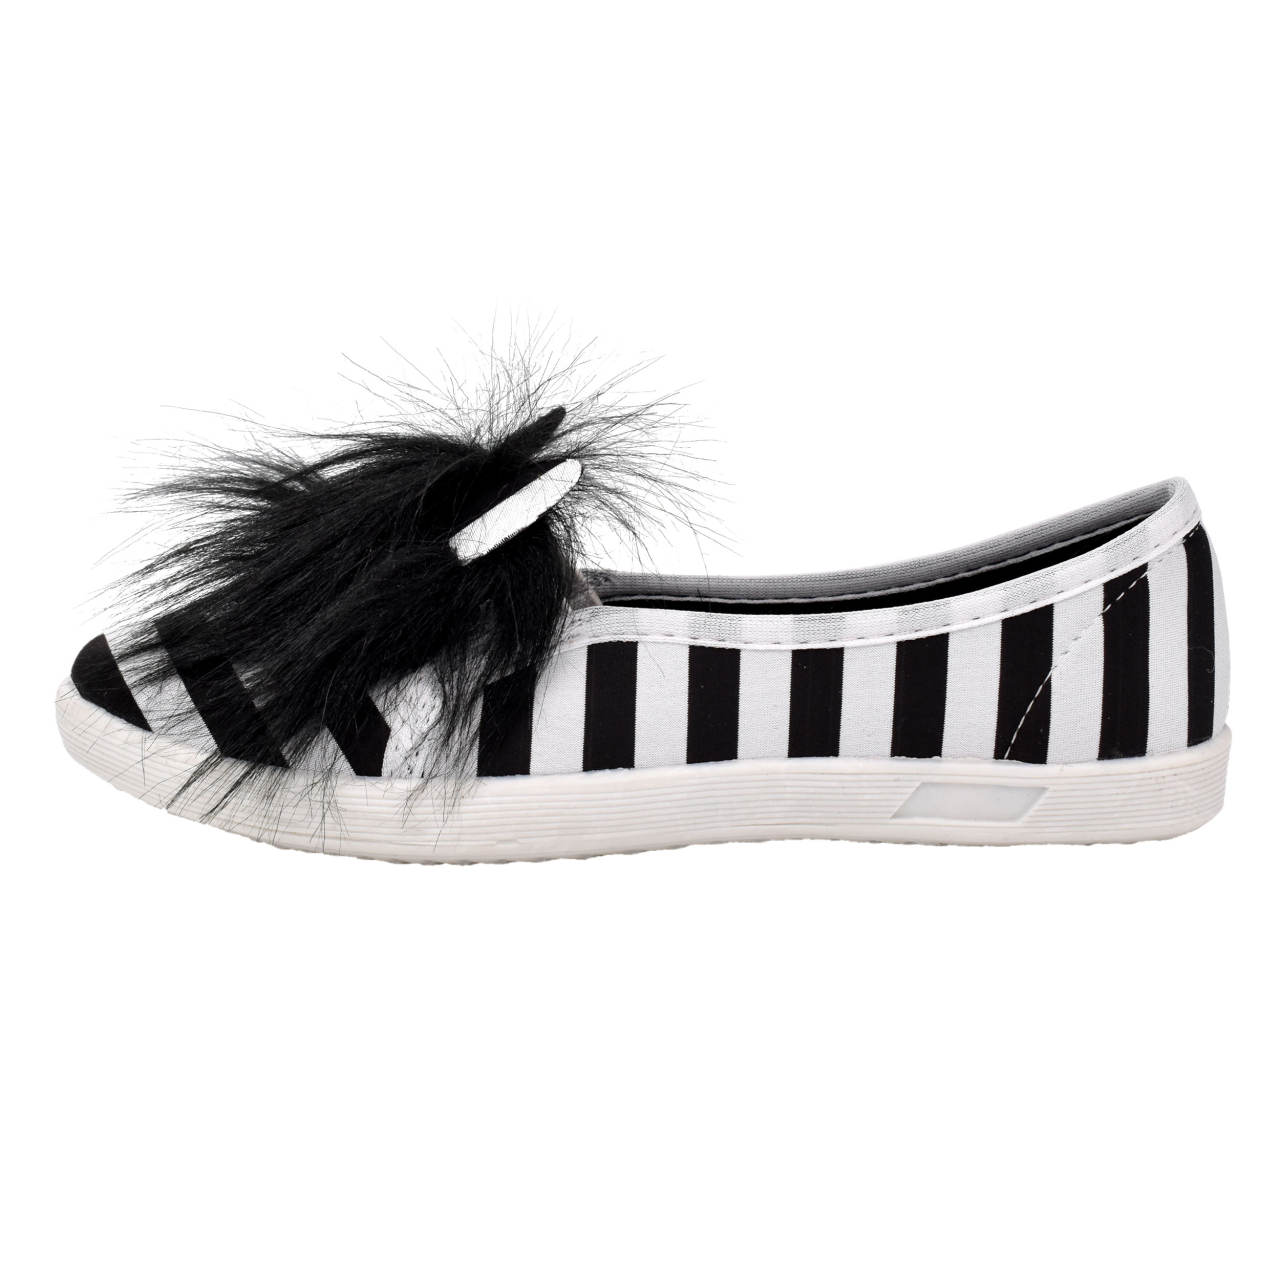 کفش روزمره زنانه مدل پینو کد 8721